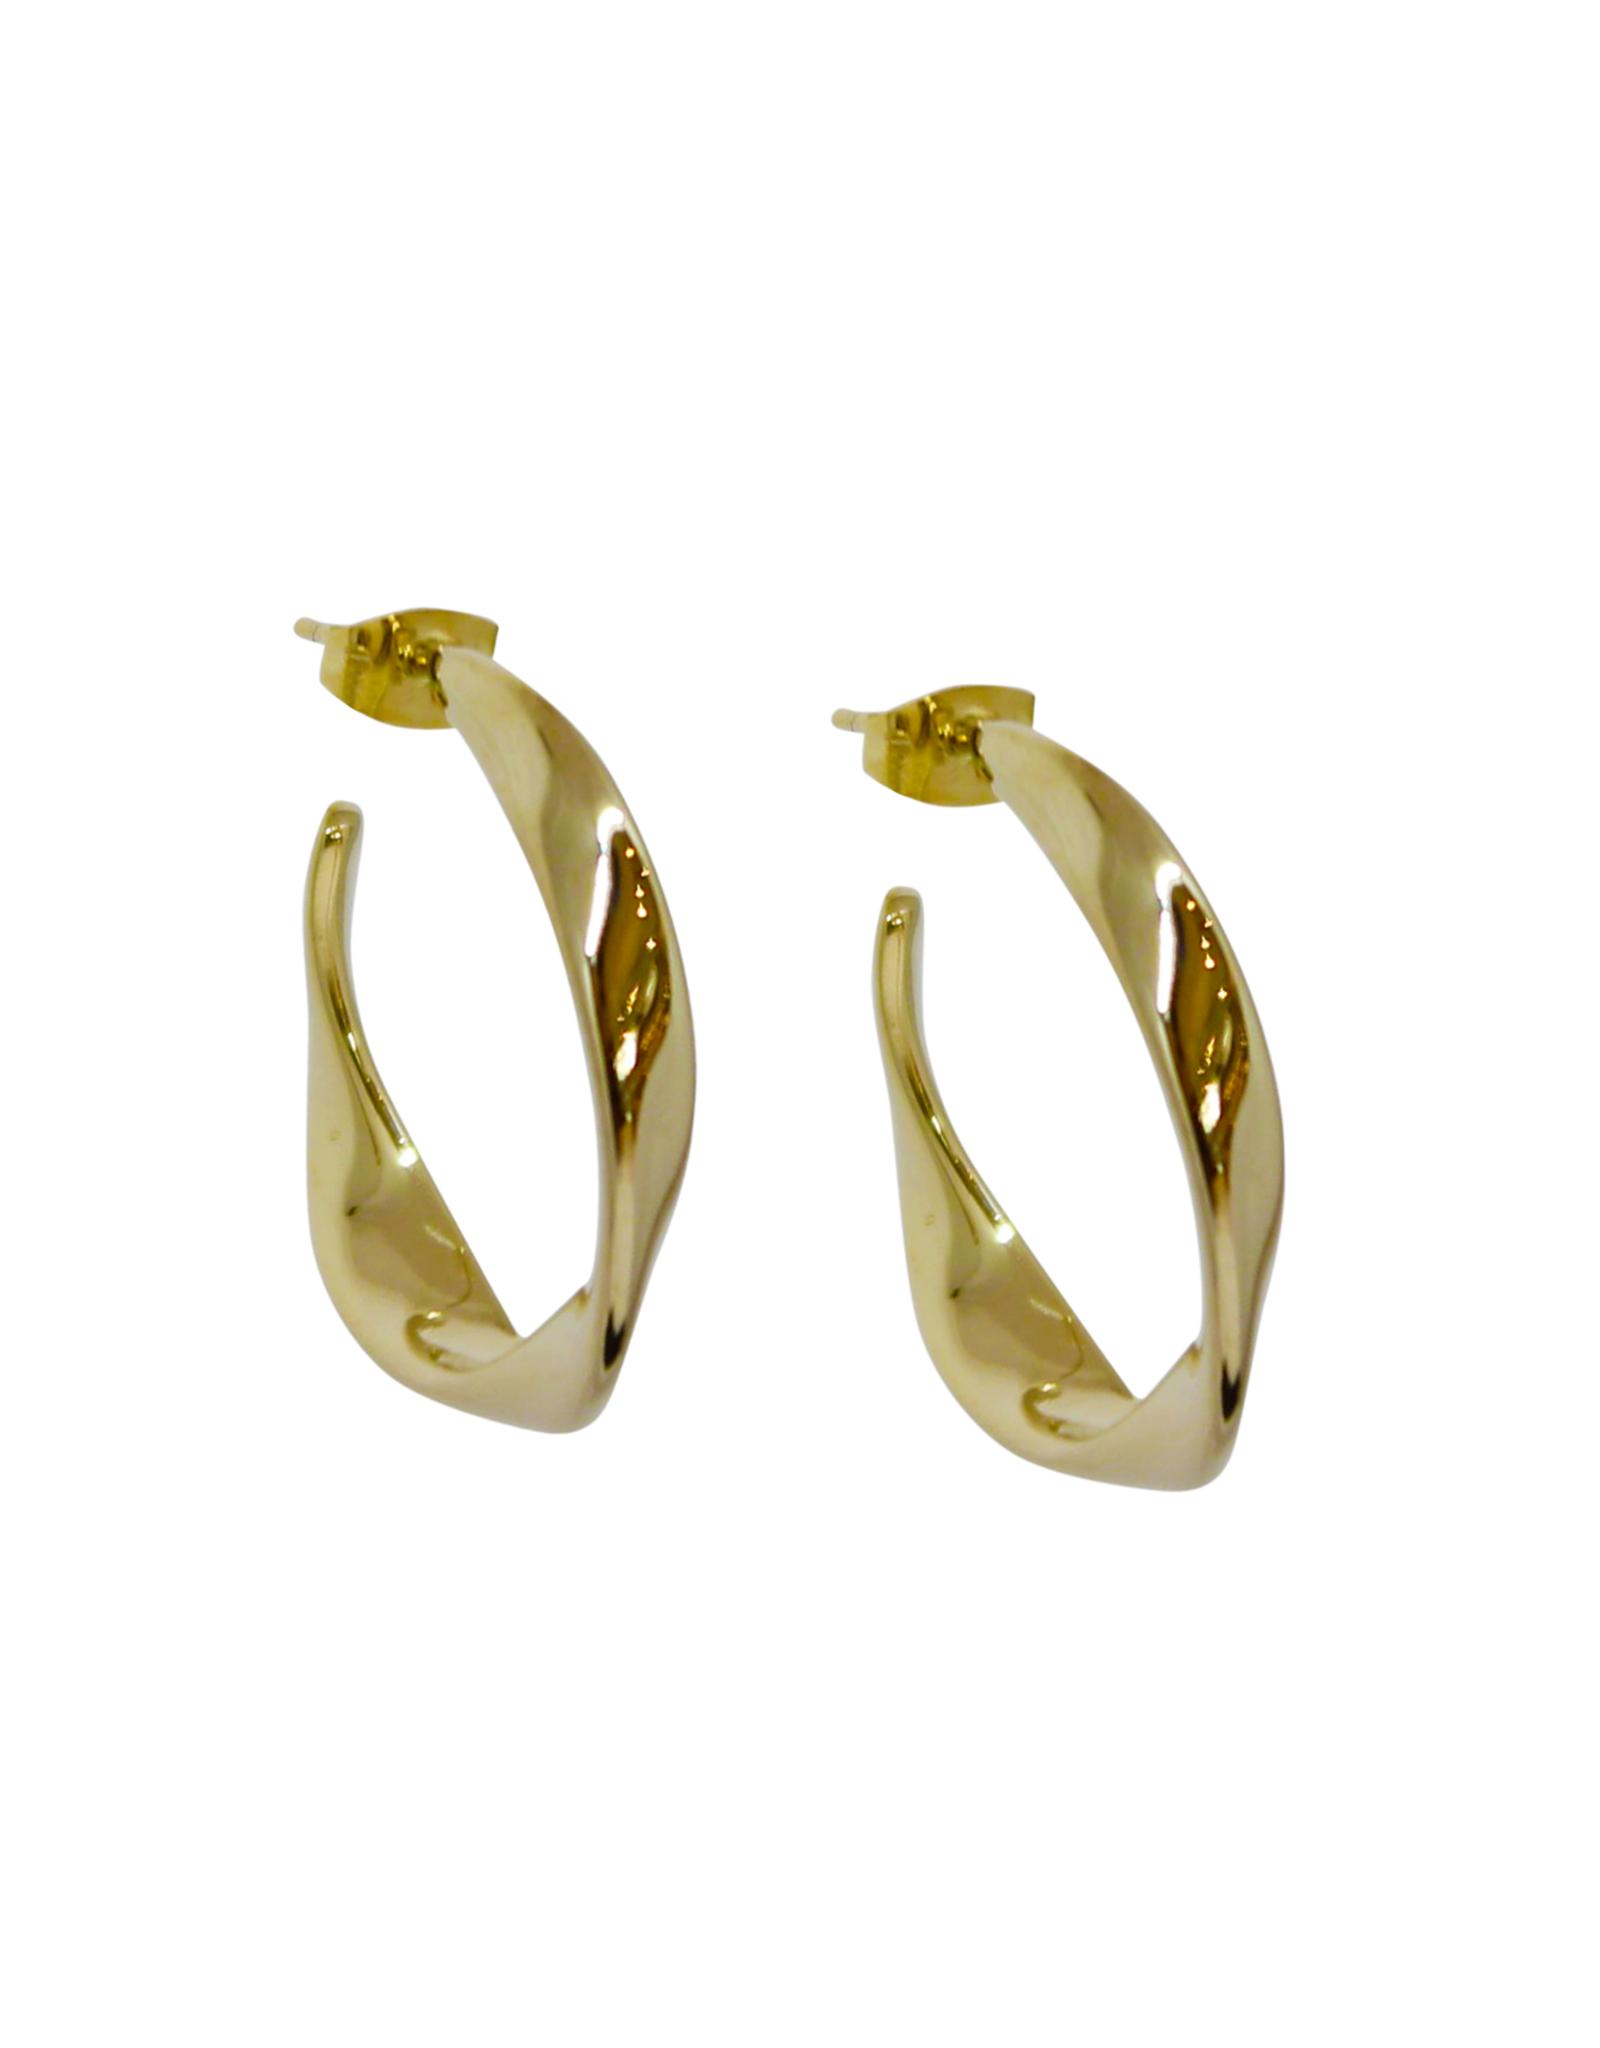 Vayu Jewels Organic Hoops